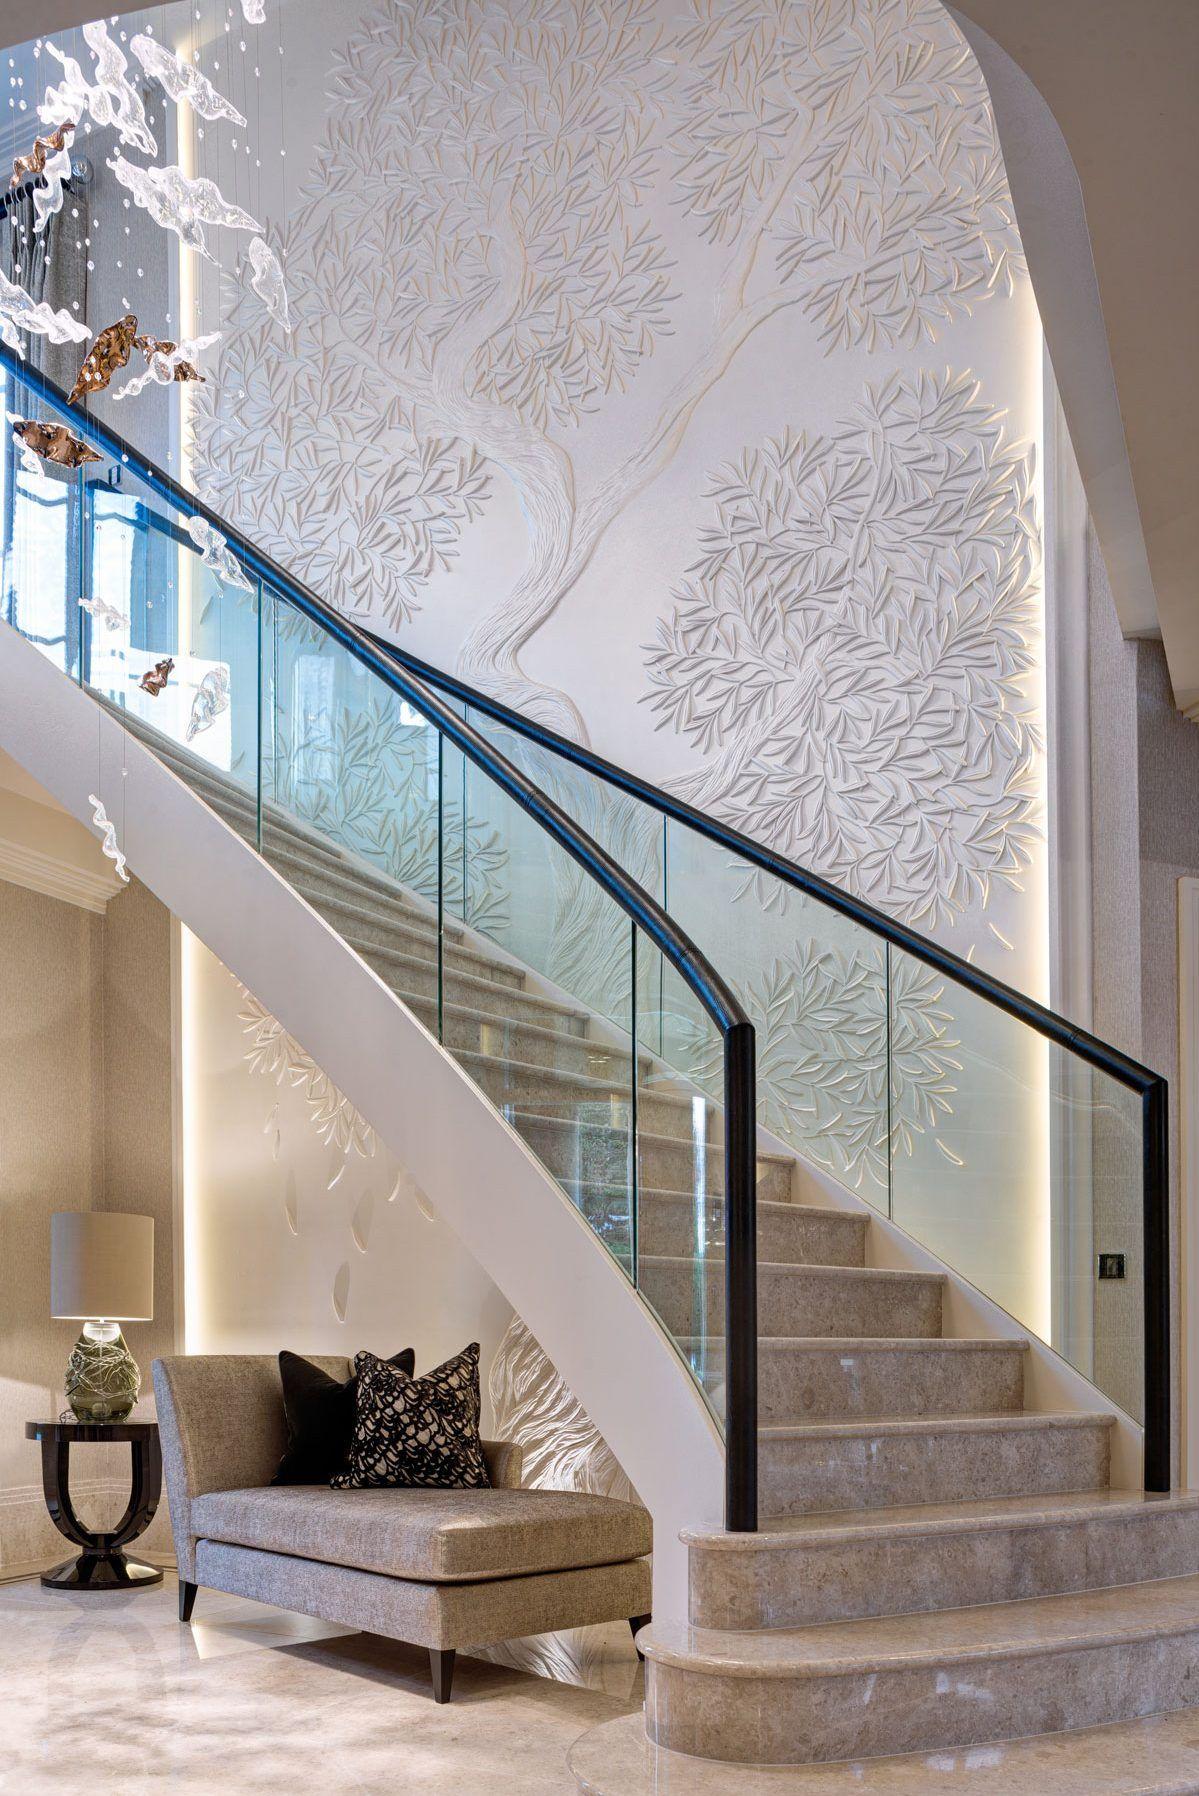 Elegant Art Deco Interiors for a Luxury Wentworth Refurbishment | SBID